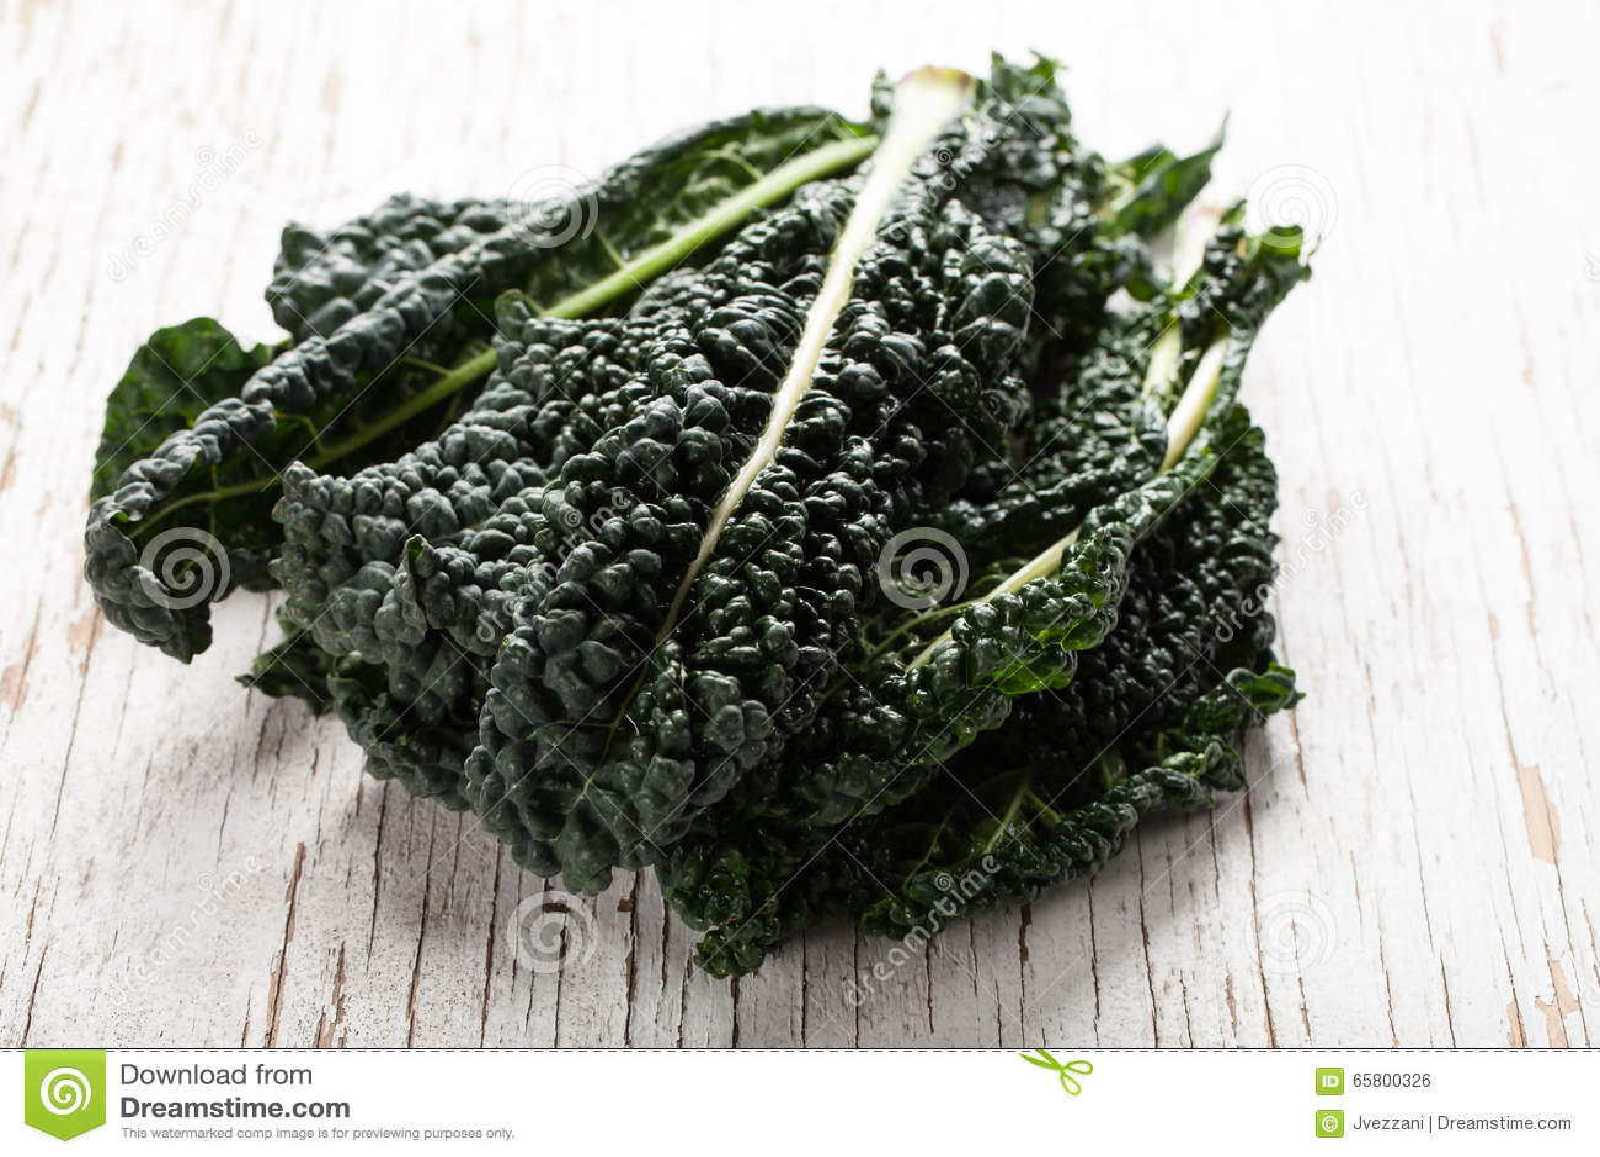 Crisp organic green lacinato kale